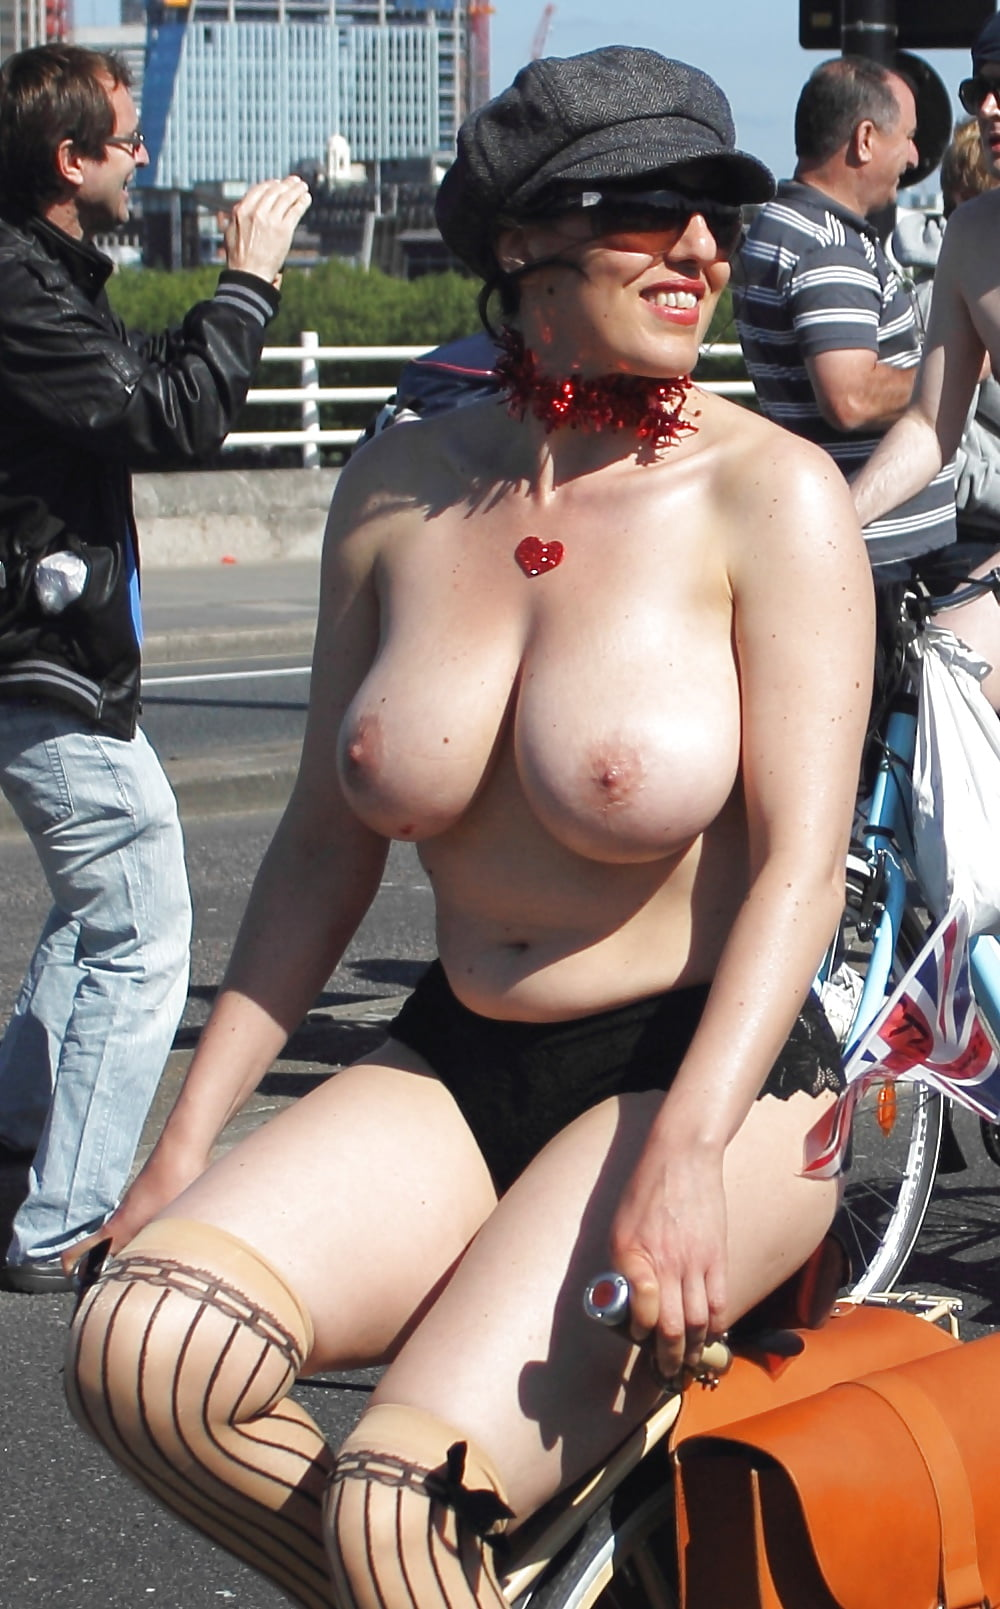 Bike Riding Busty Milfs - 69 Pics  Xhamster